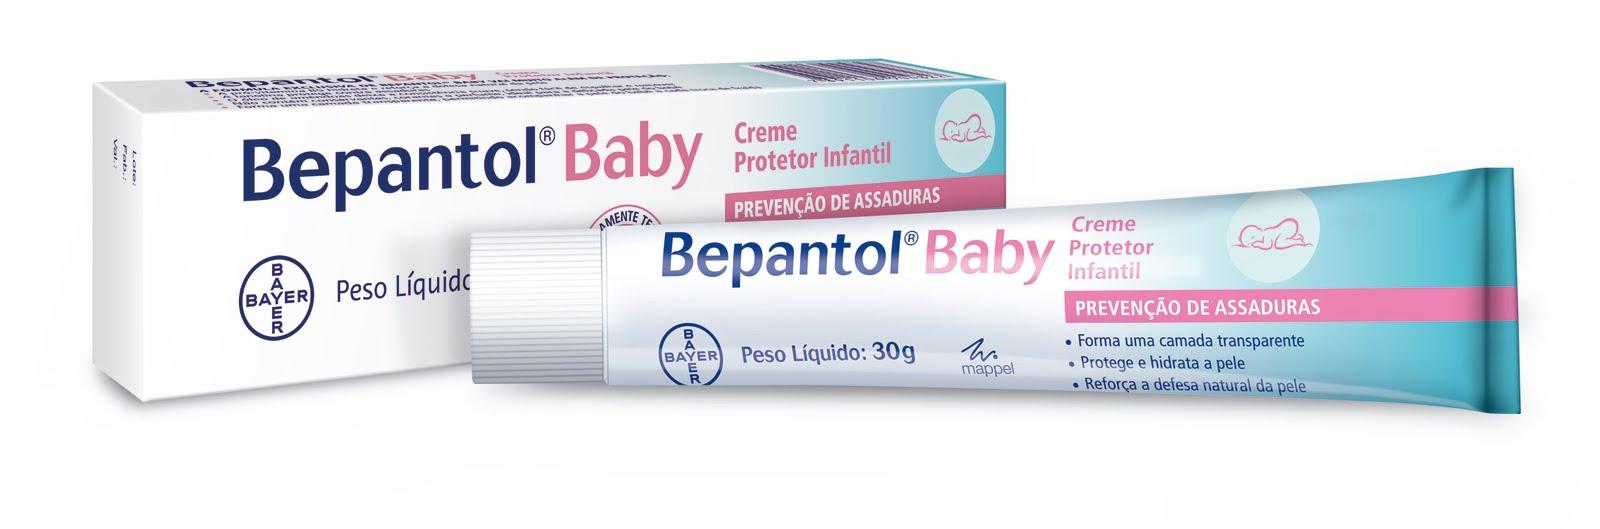 pomada-assaduras-bepantol-baby